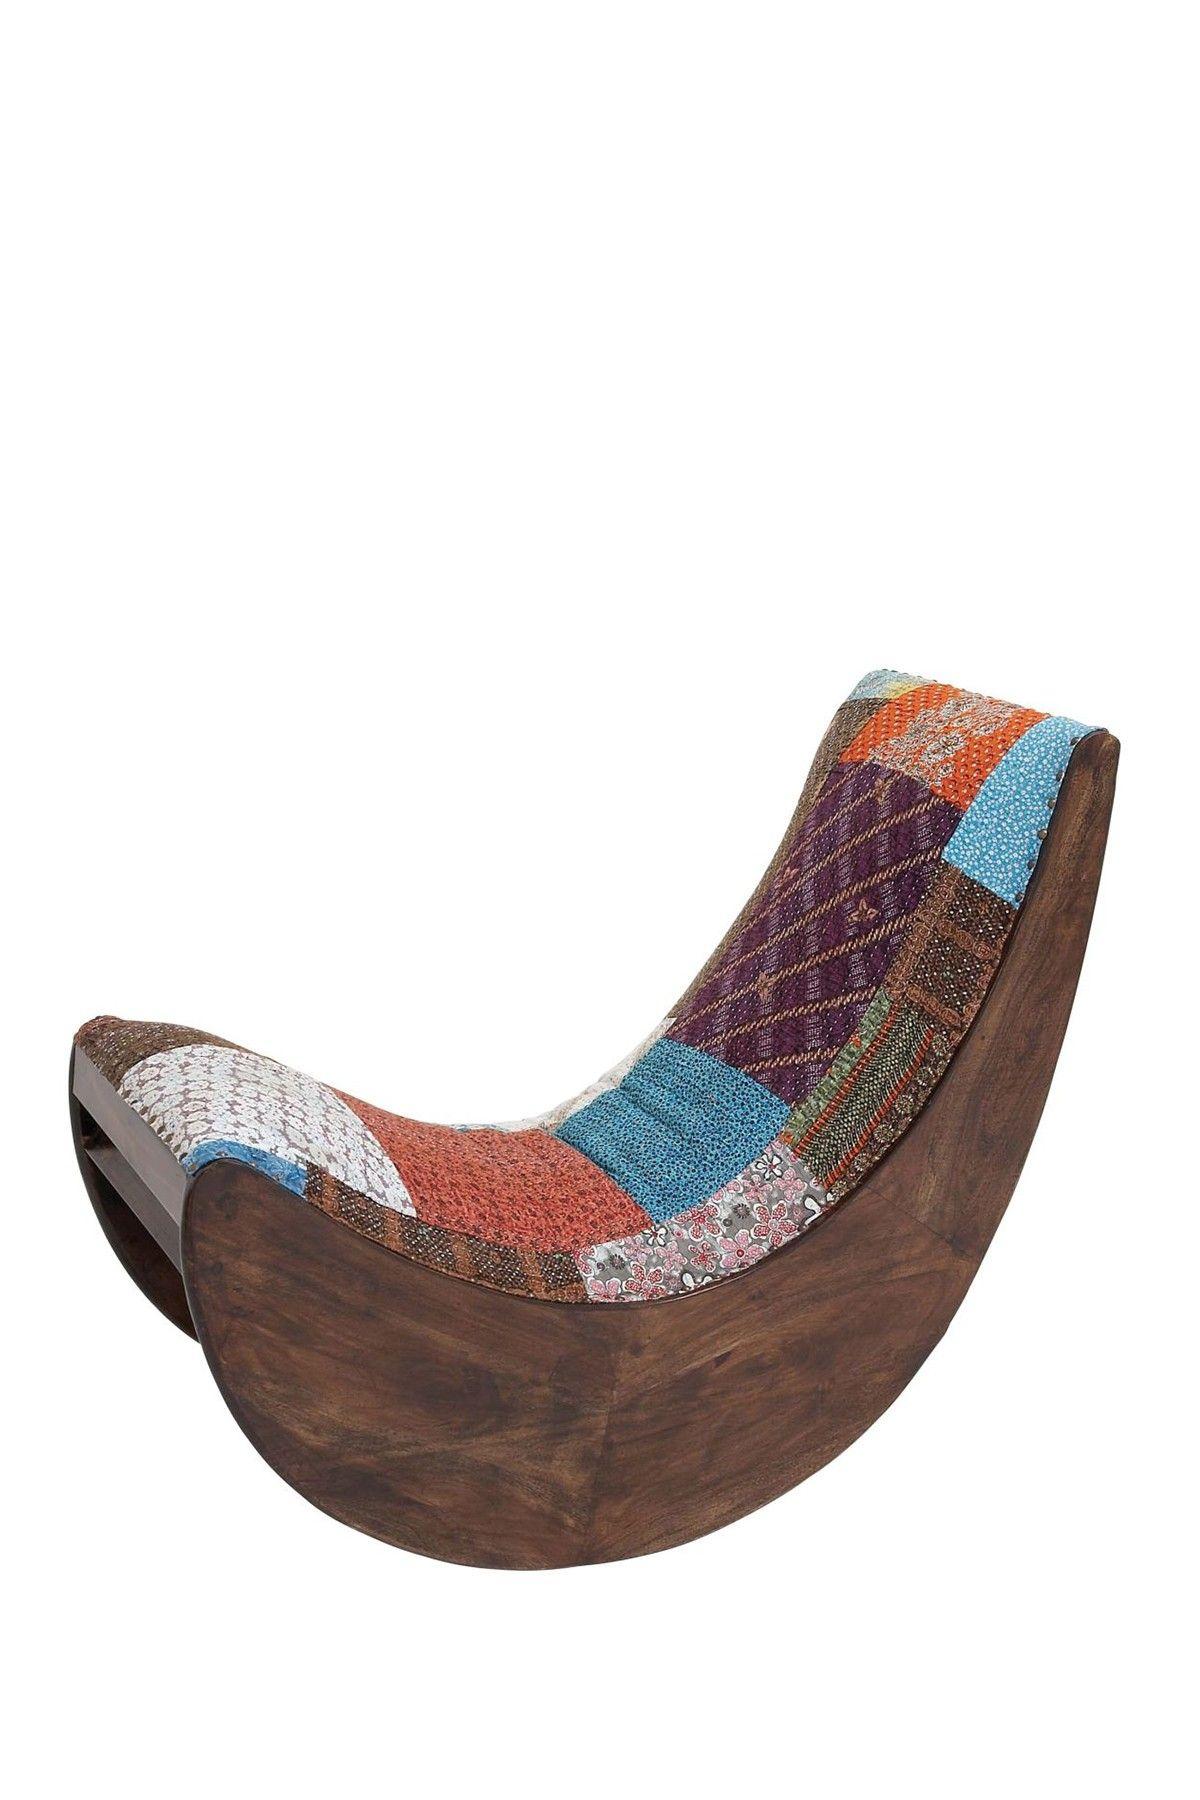 UMA Wood Fabric Rocking Chair Rocking chair, Banana